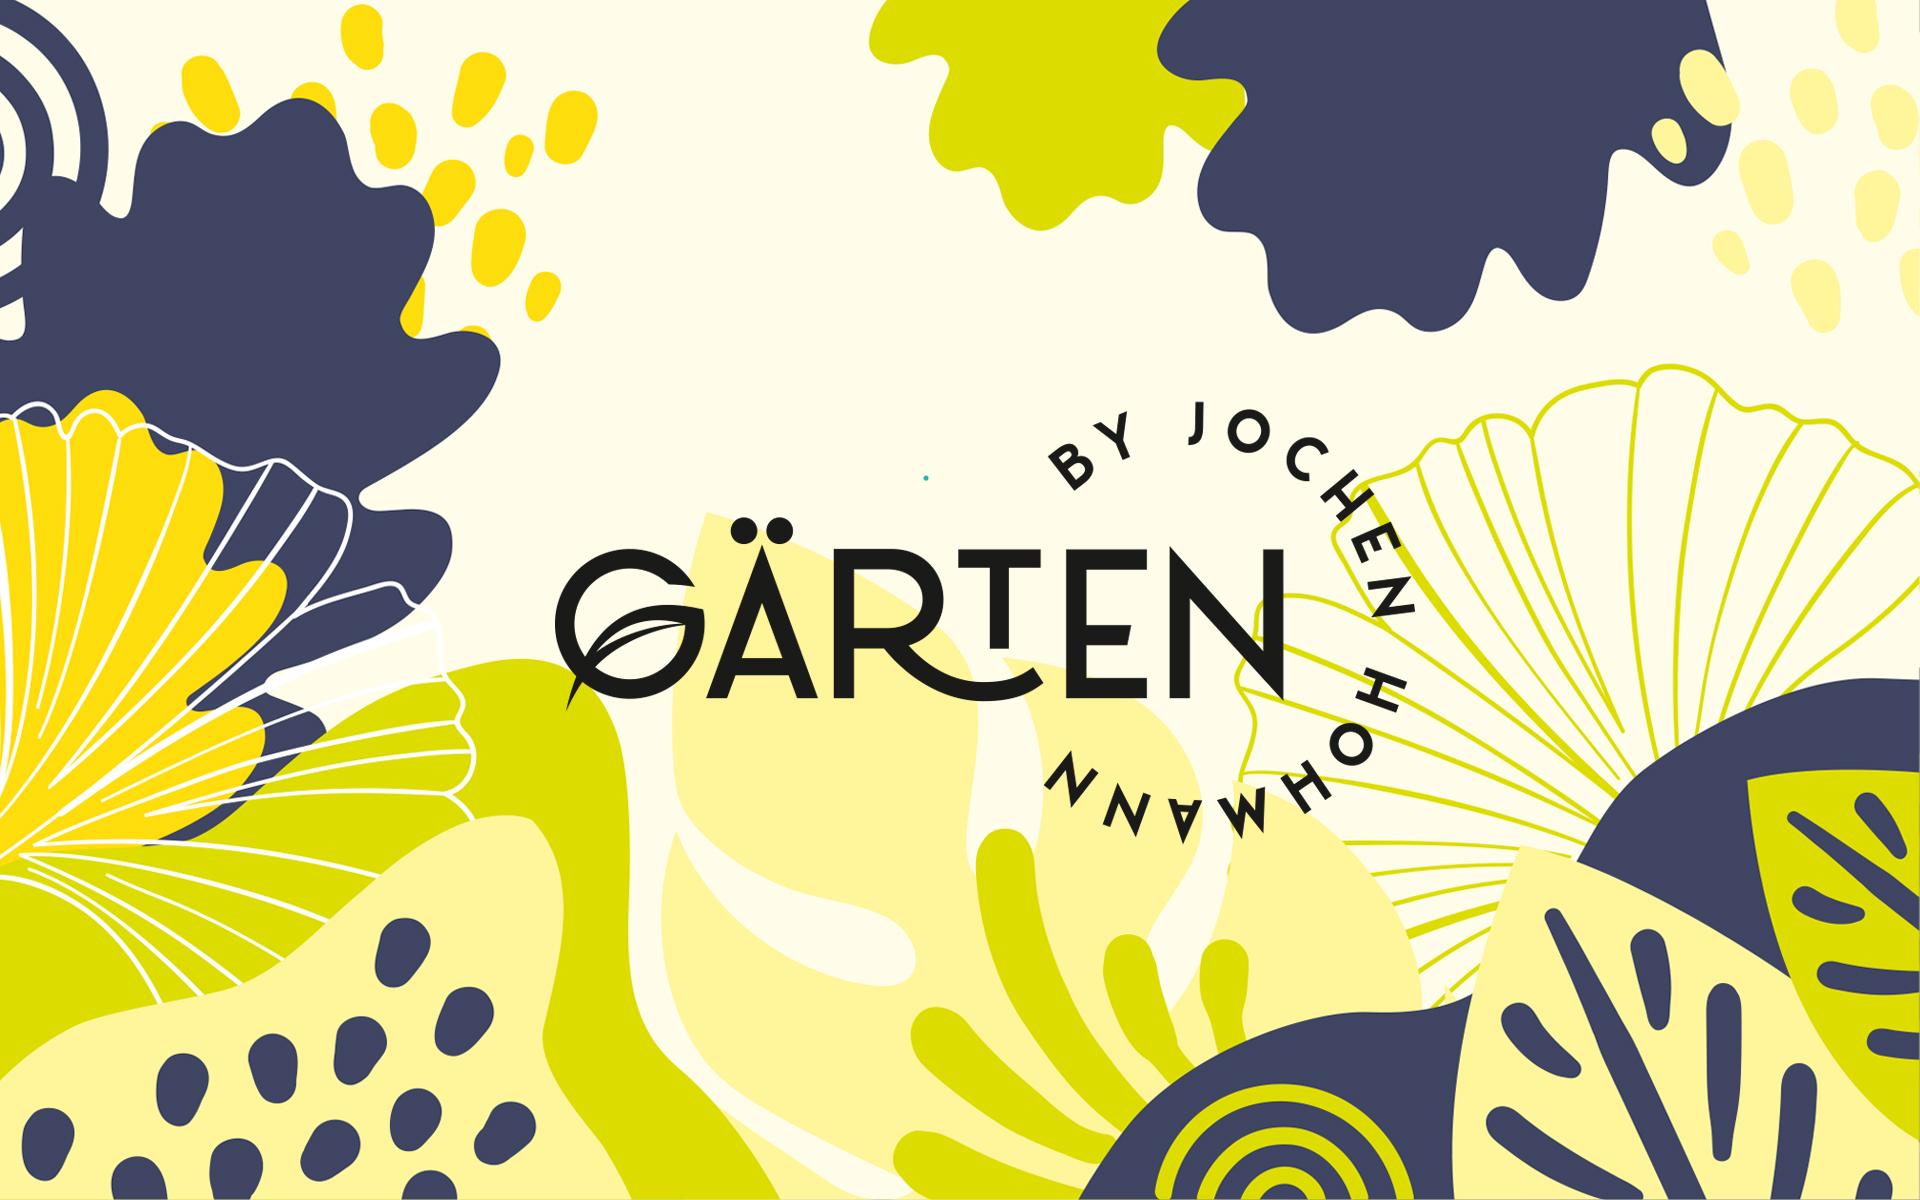 Gärten – by Jochen Hohmann